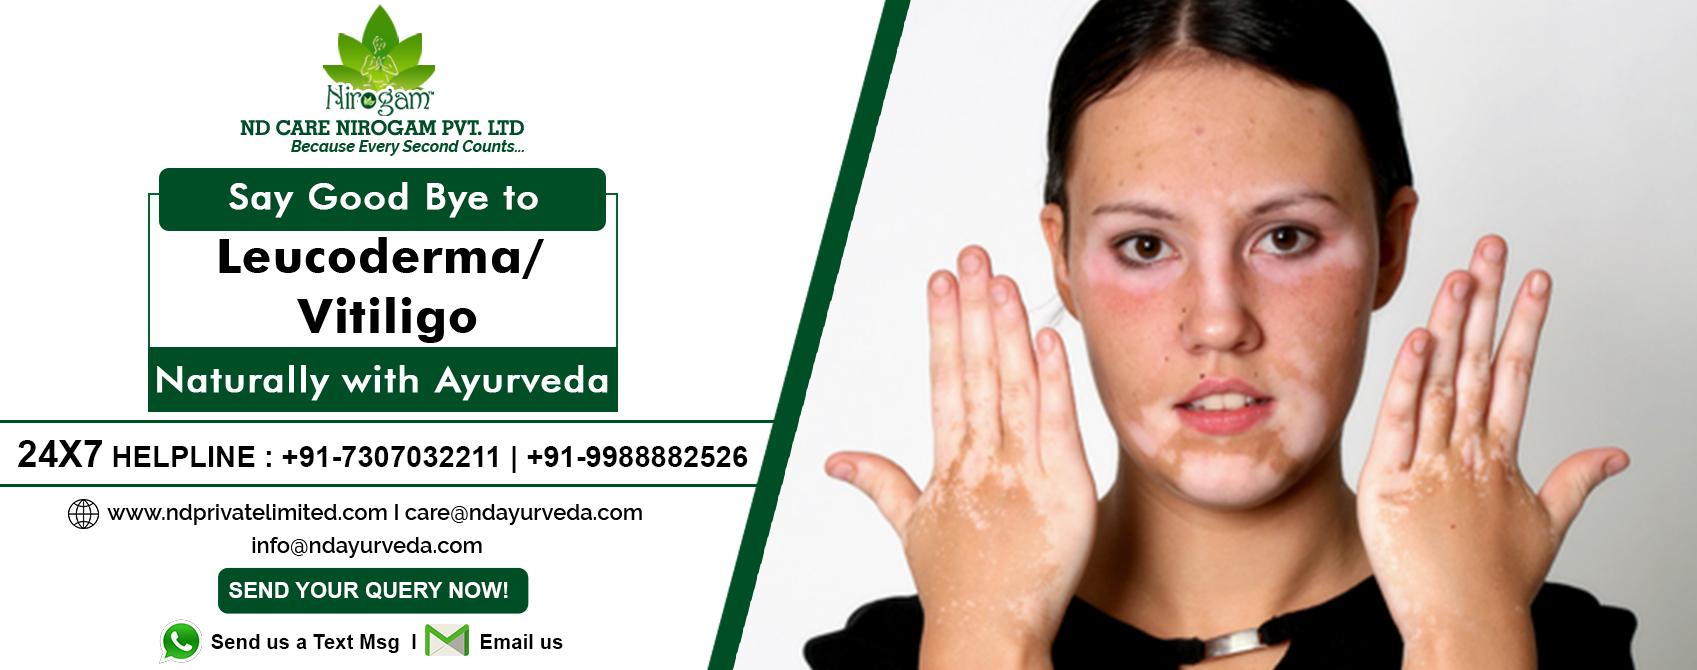 Ayurvedic Treatment of Leucoderma,Vitiligo   ND Care Nirogam Pvt  Ltd